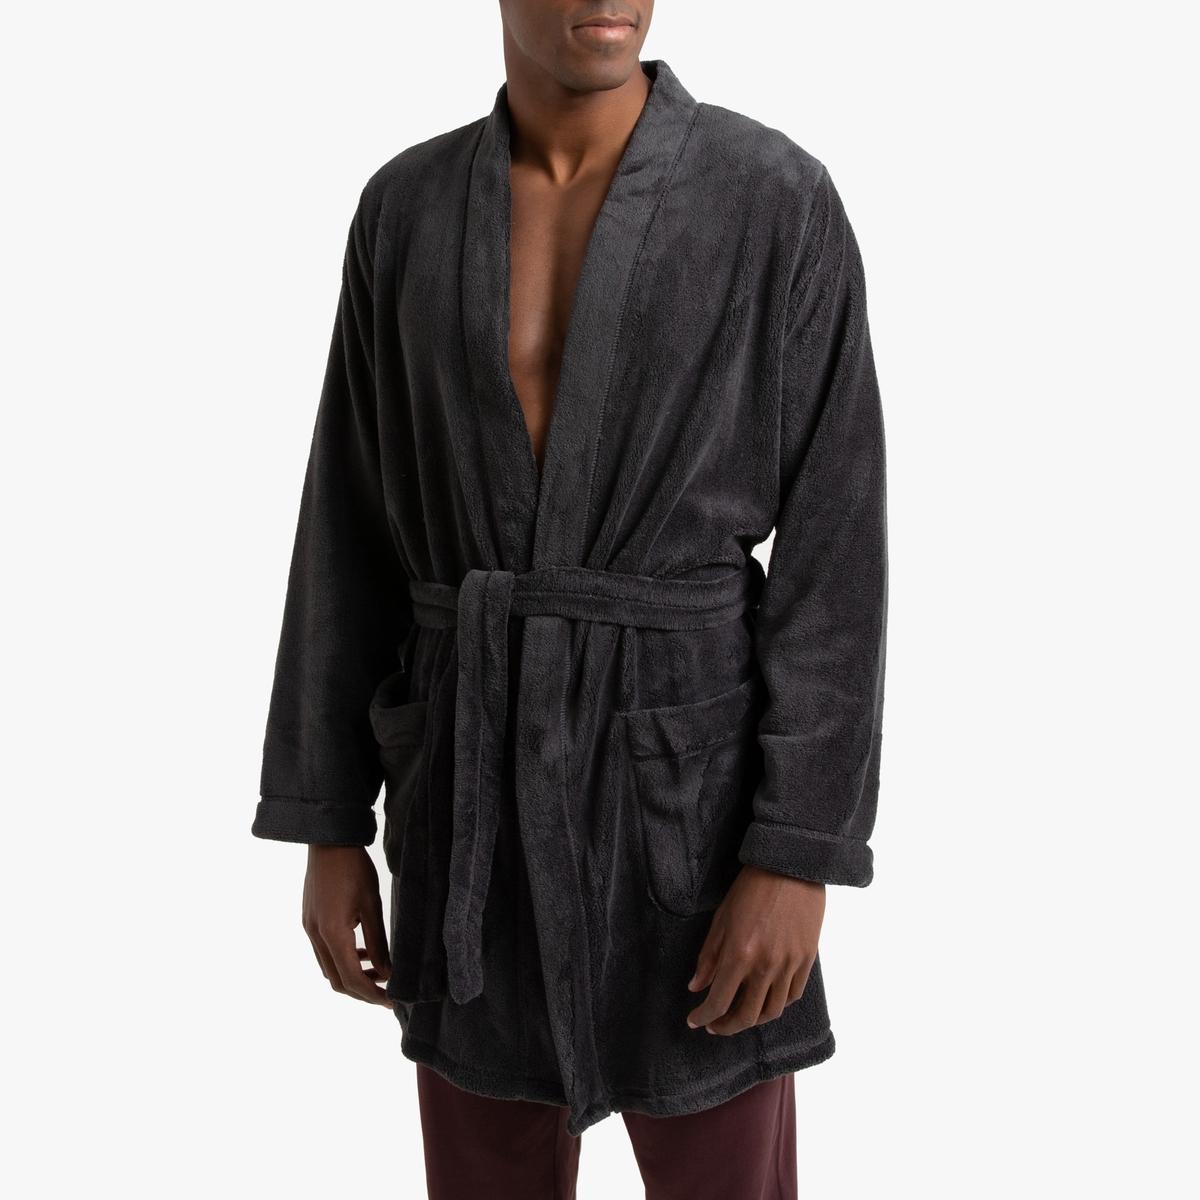 цена Халат La Redoute Домашний из флиса XXL серый онлайн в 2017 году